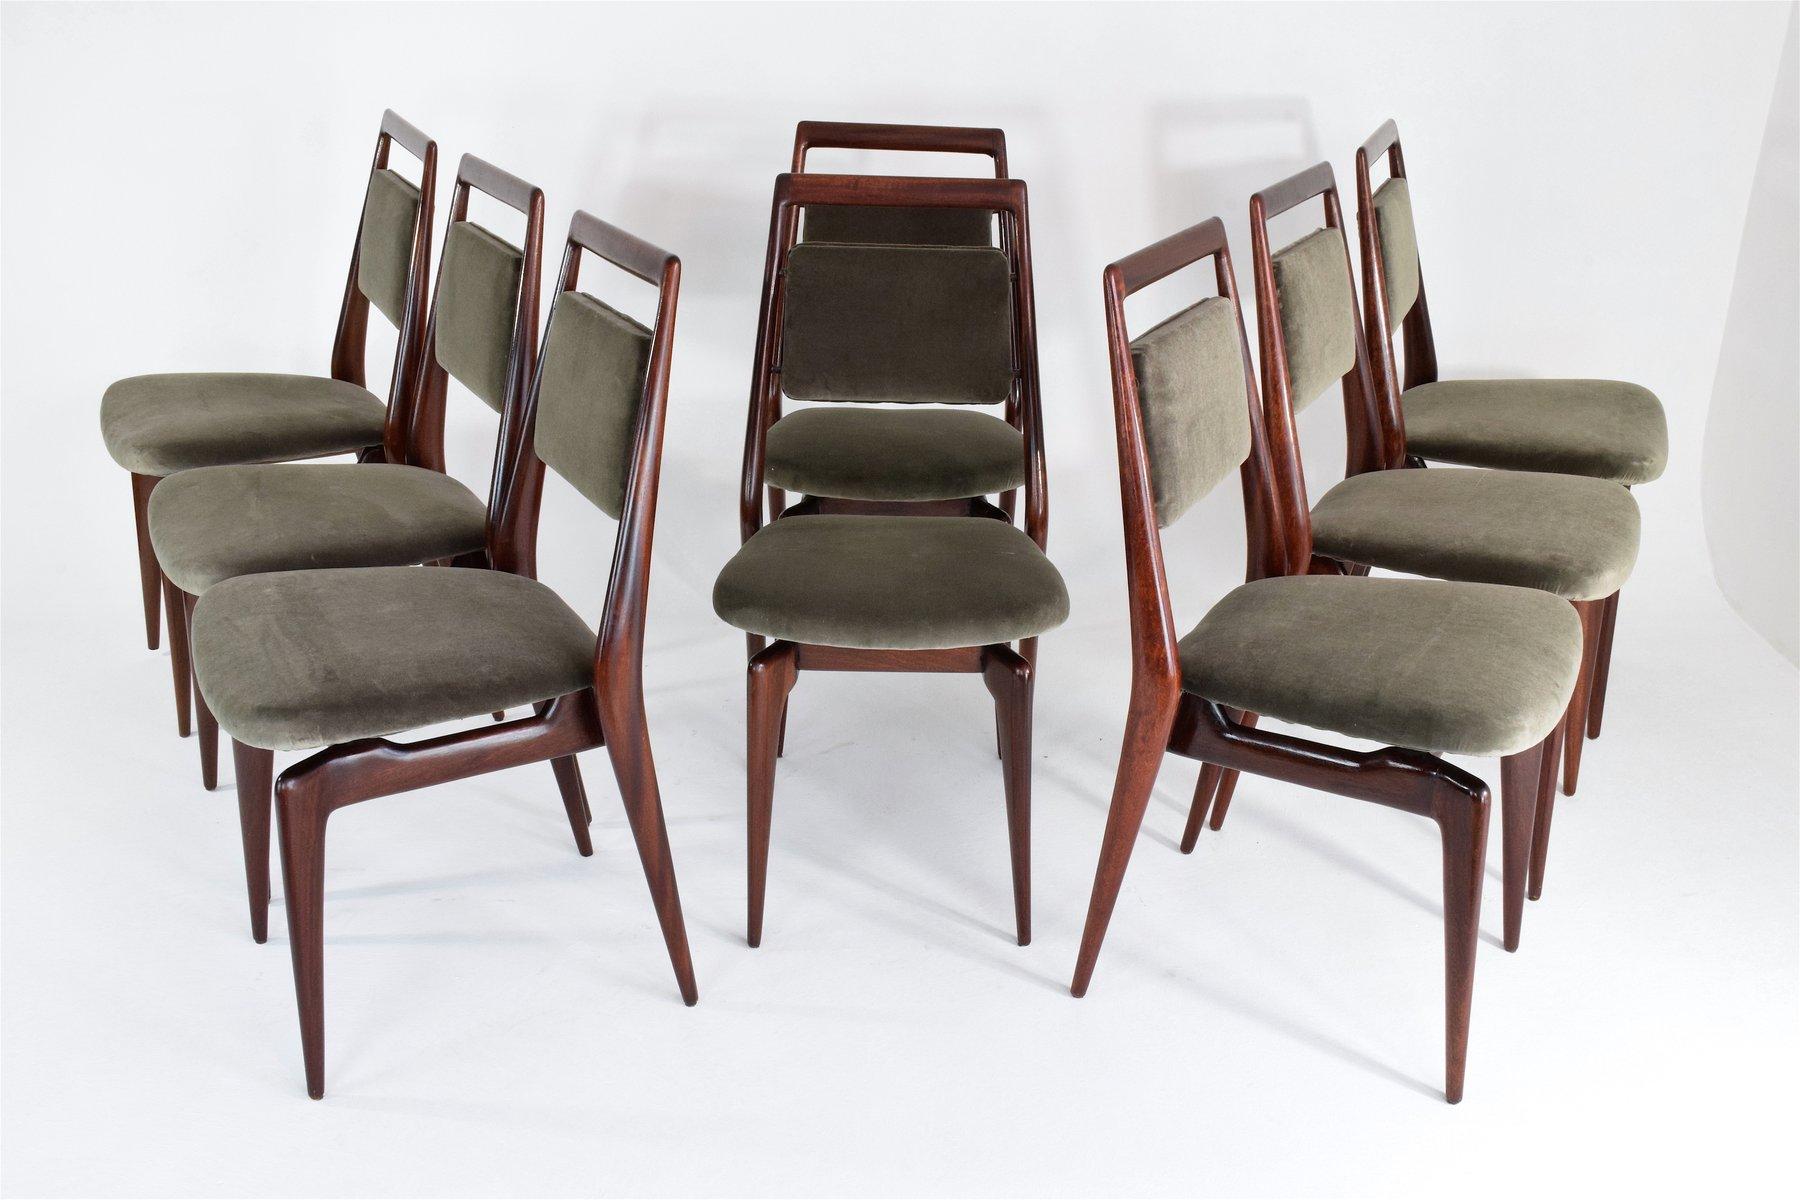 velvet dining chairs australia massage chair recliner mid century italian set of 6 for